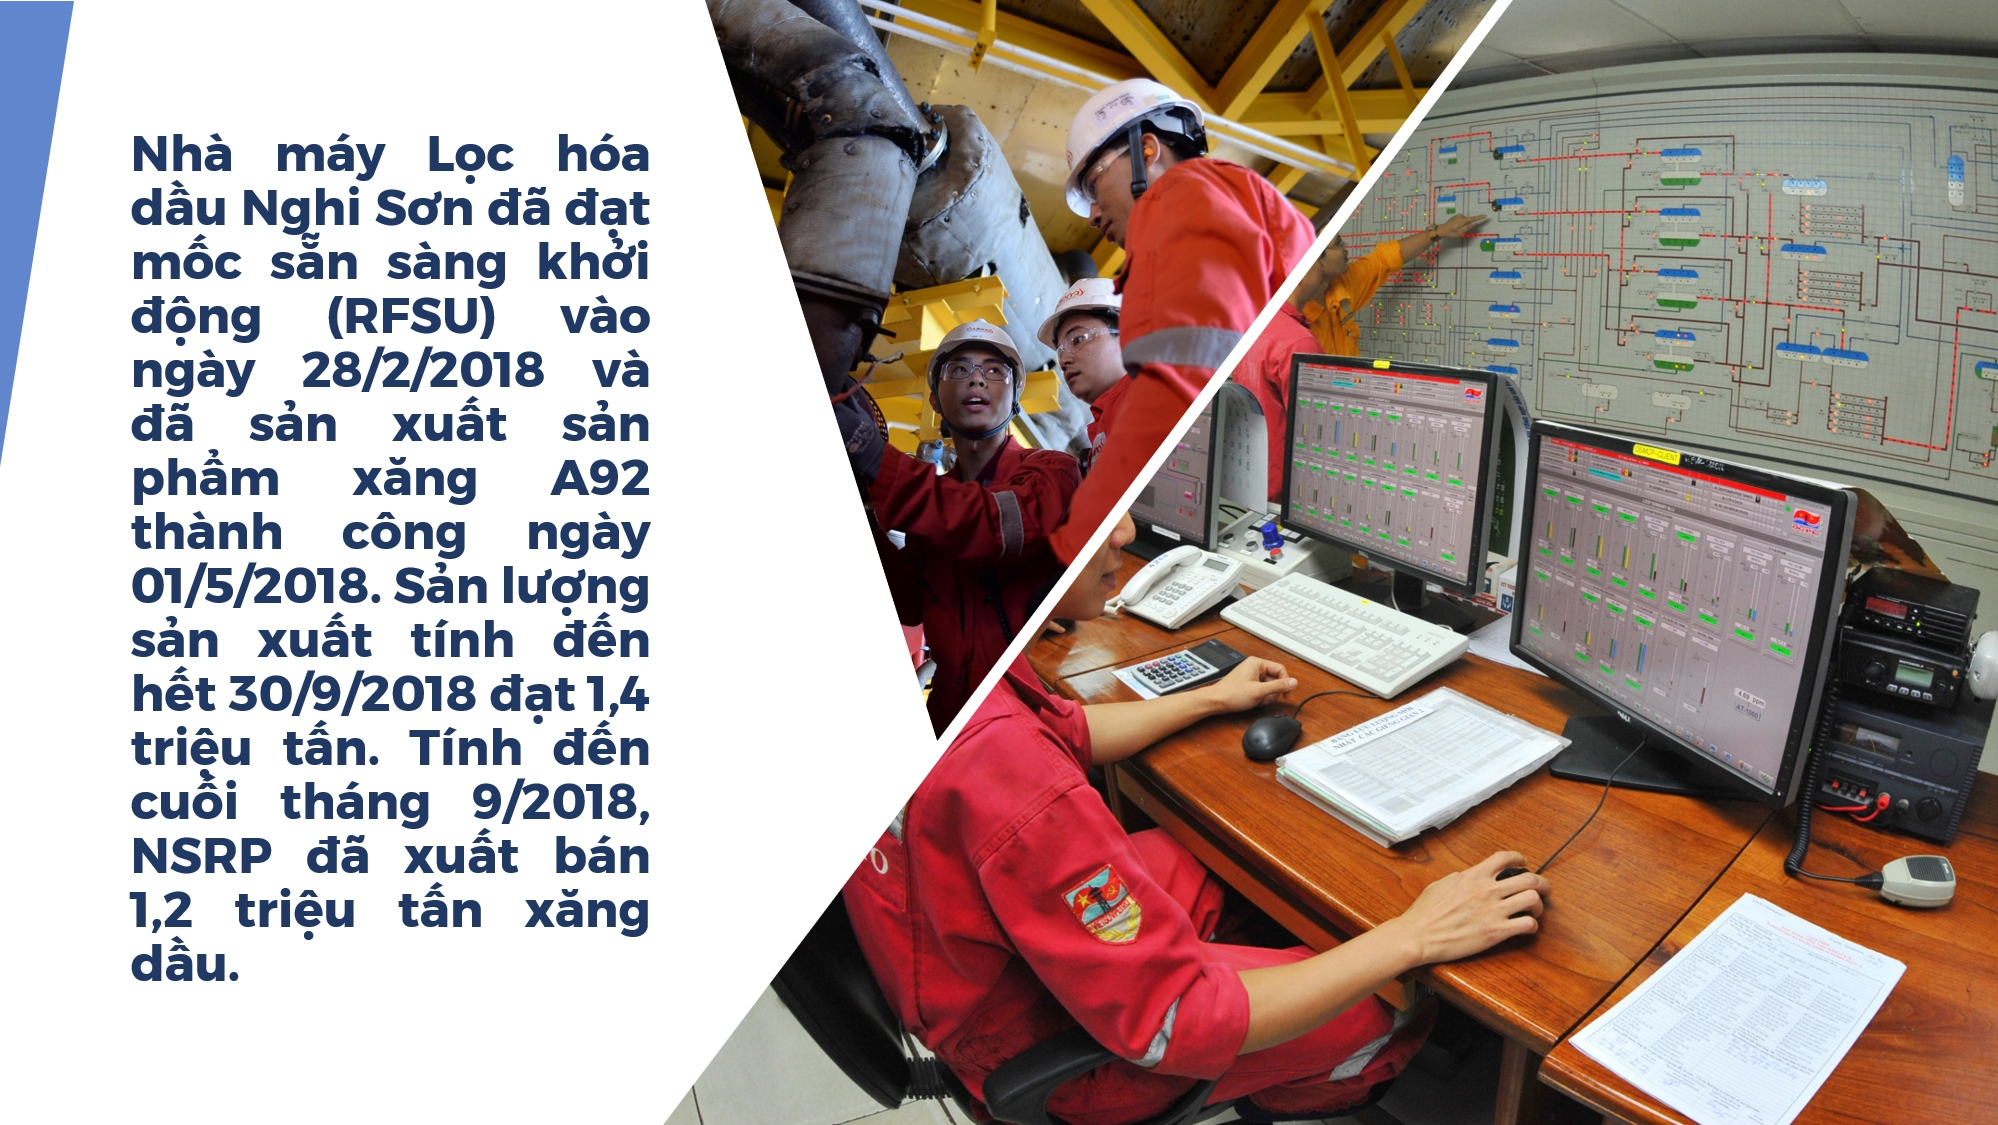 e magazine pvn huong toi hoan thanh toan dien cac chi tieu nhiem vu nam 2018